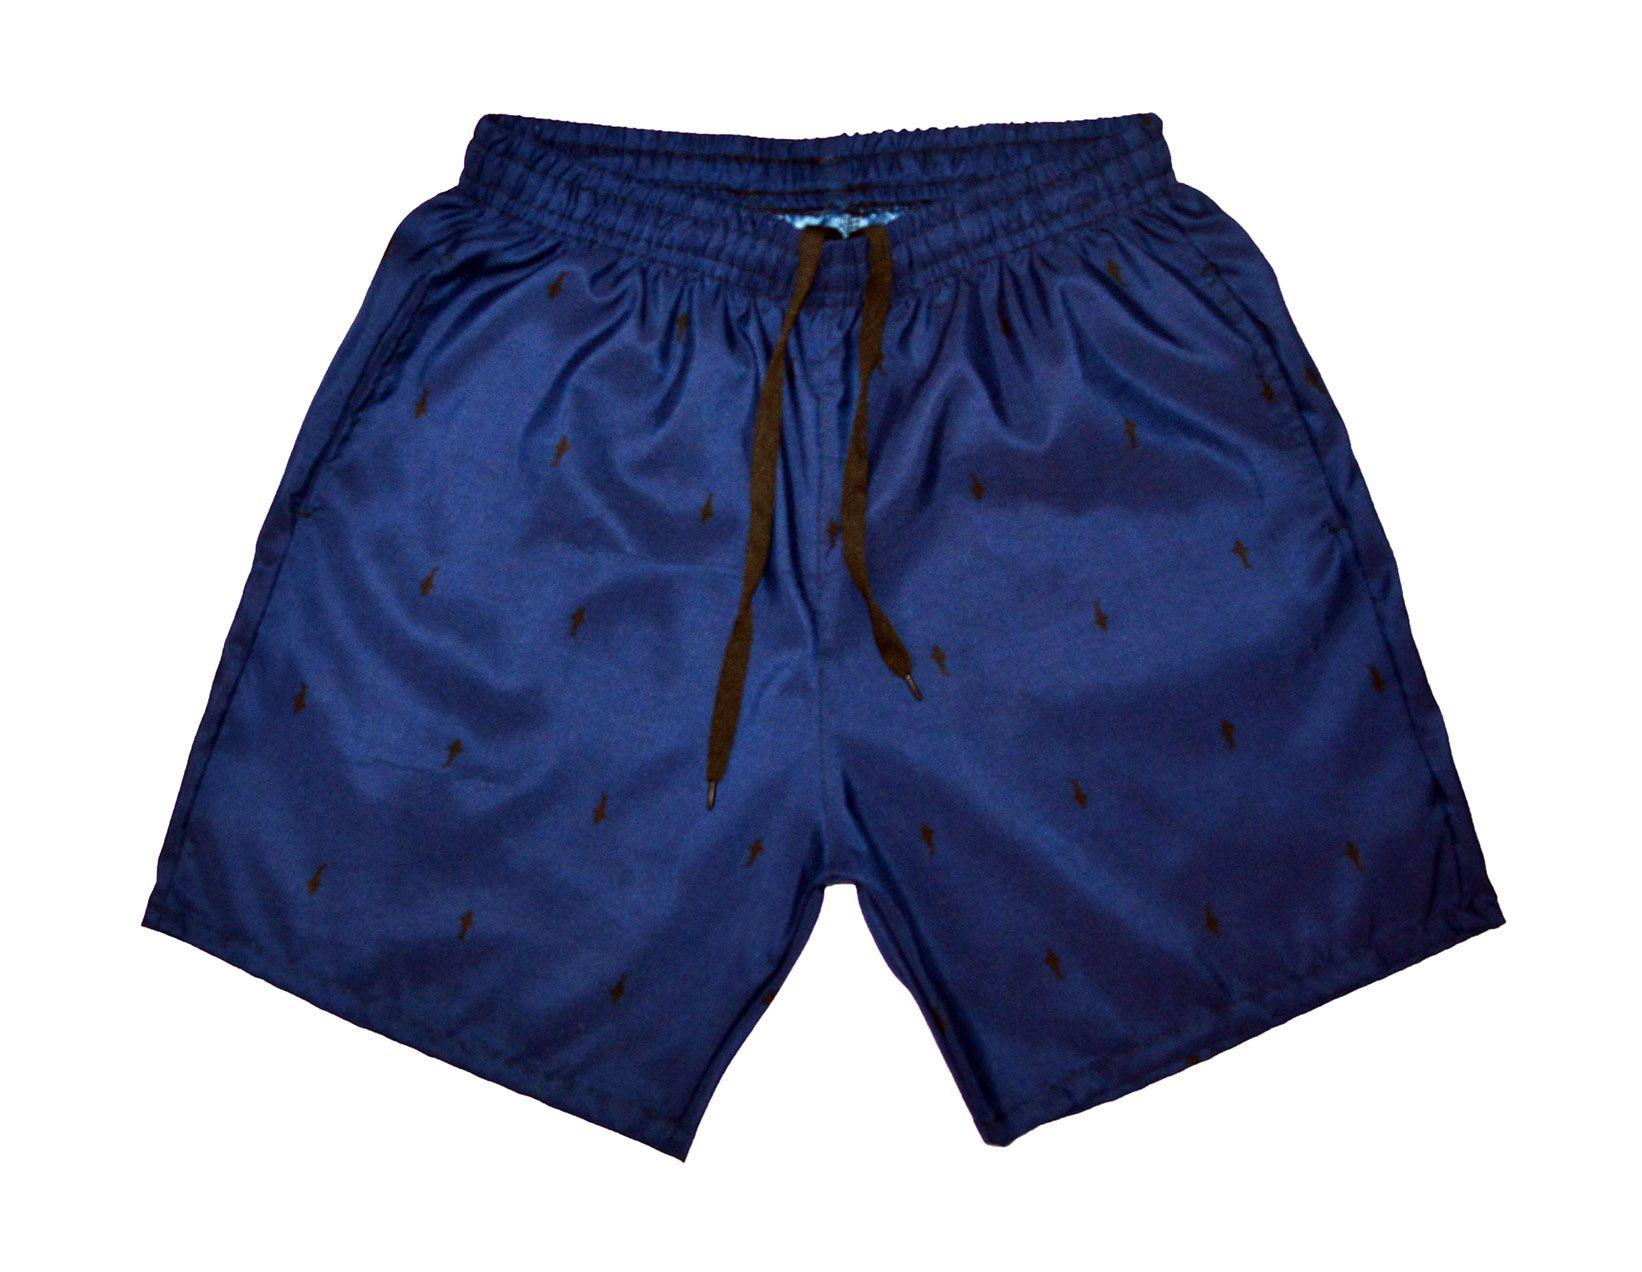 ff40e2f69d Shorts Masculino Praia Microfibra Estampado C  Bolsos Laterais Ref.386 -  Frent´s